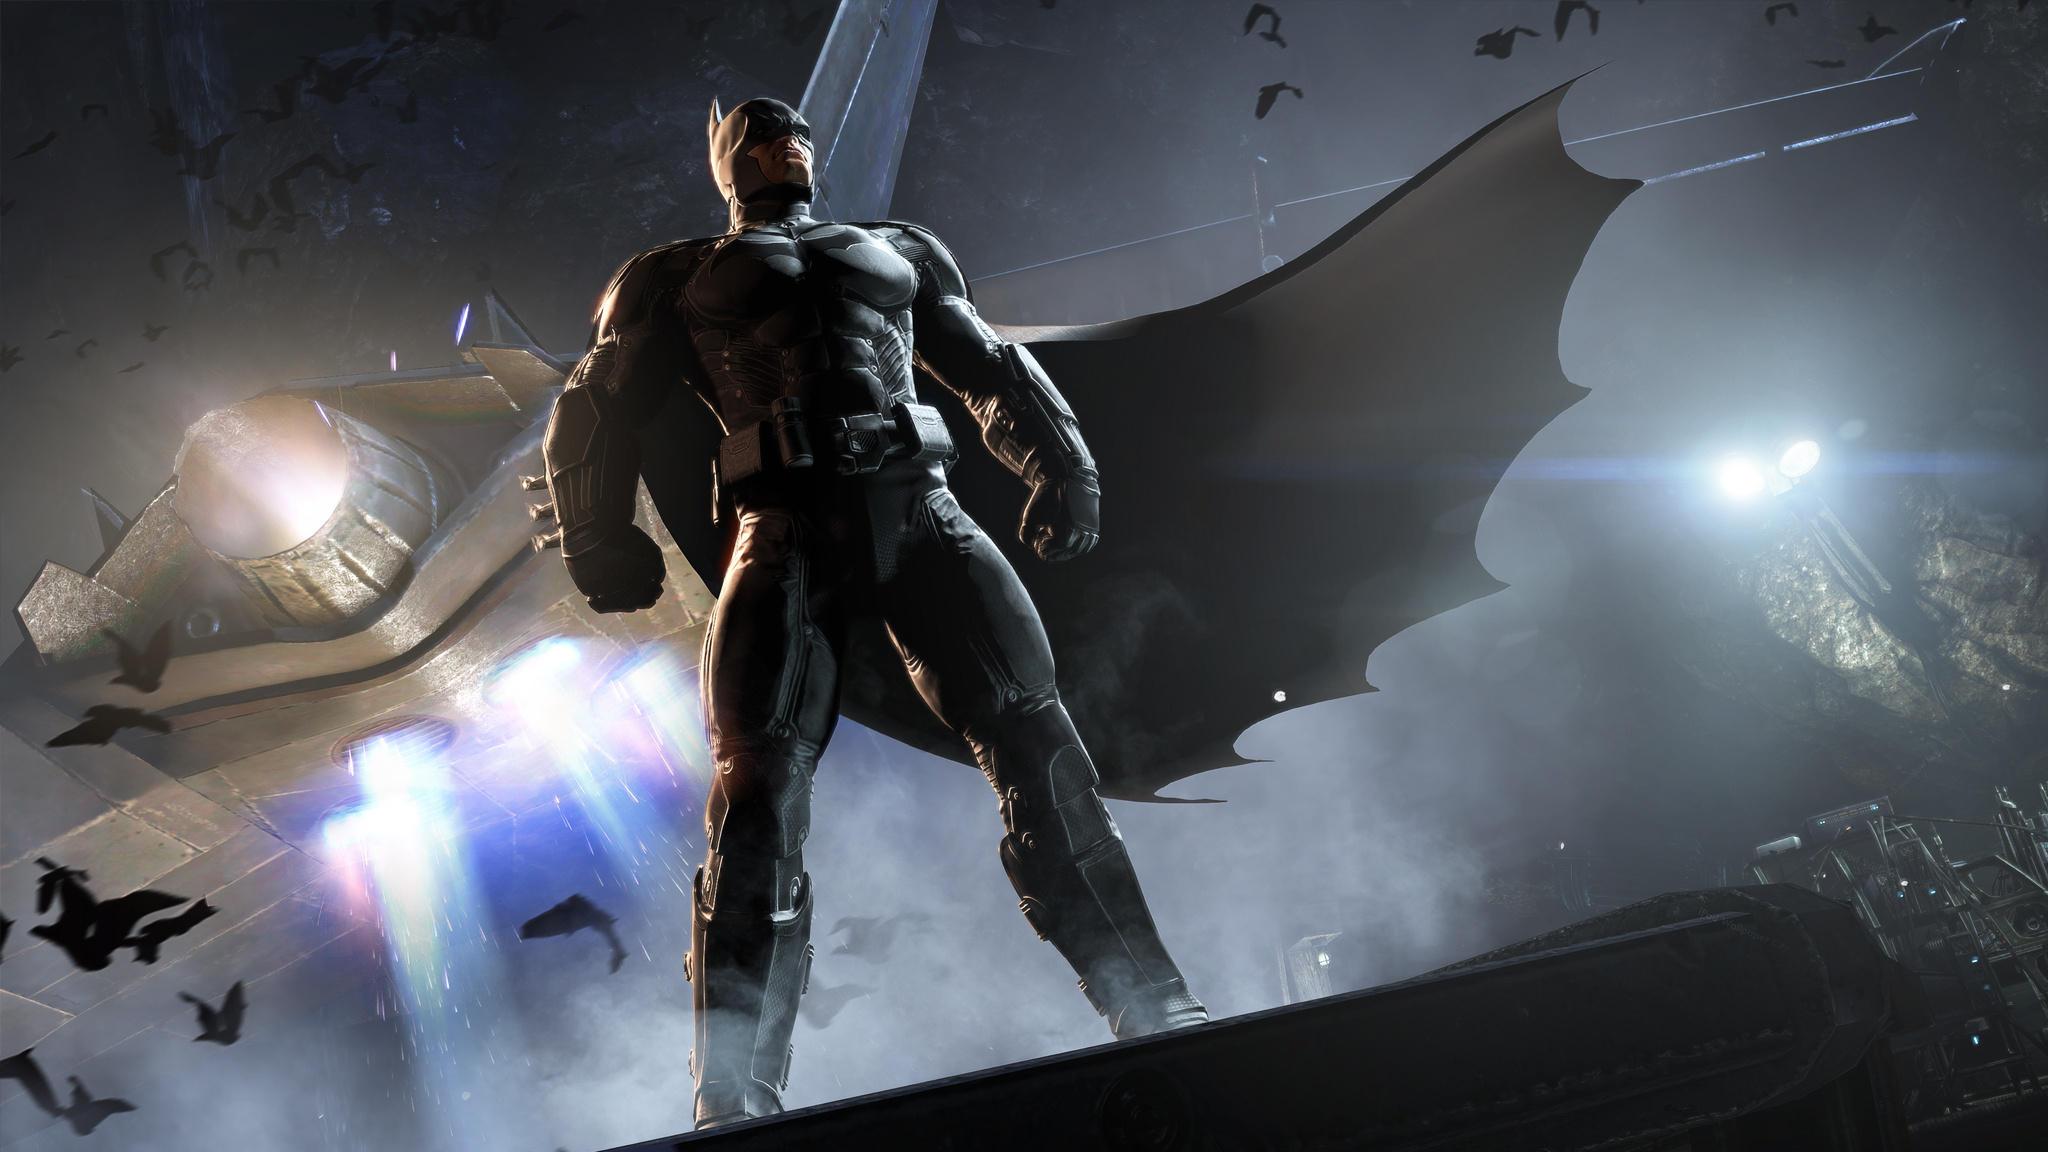 batman arkham origins introduces you to barbara gordon